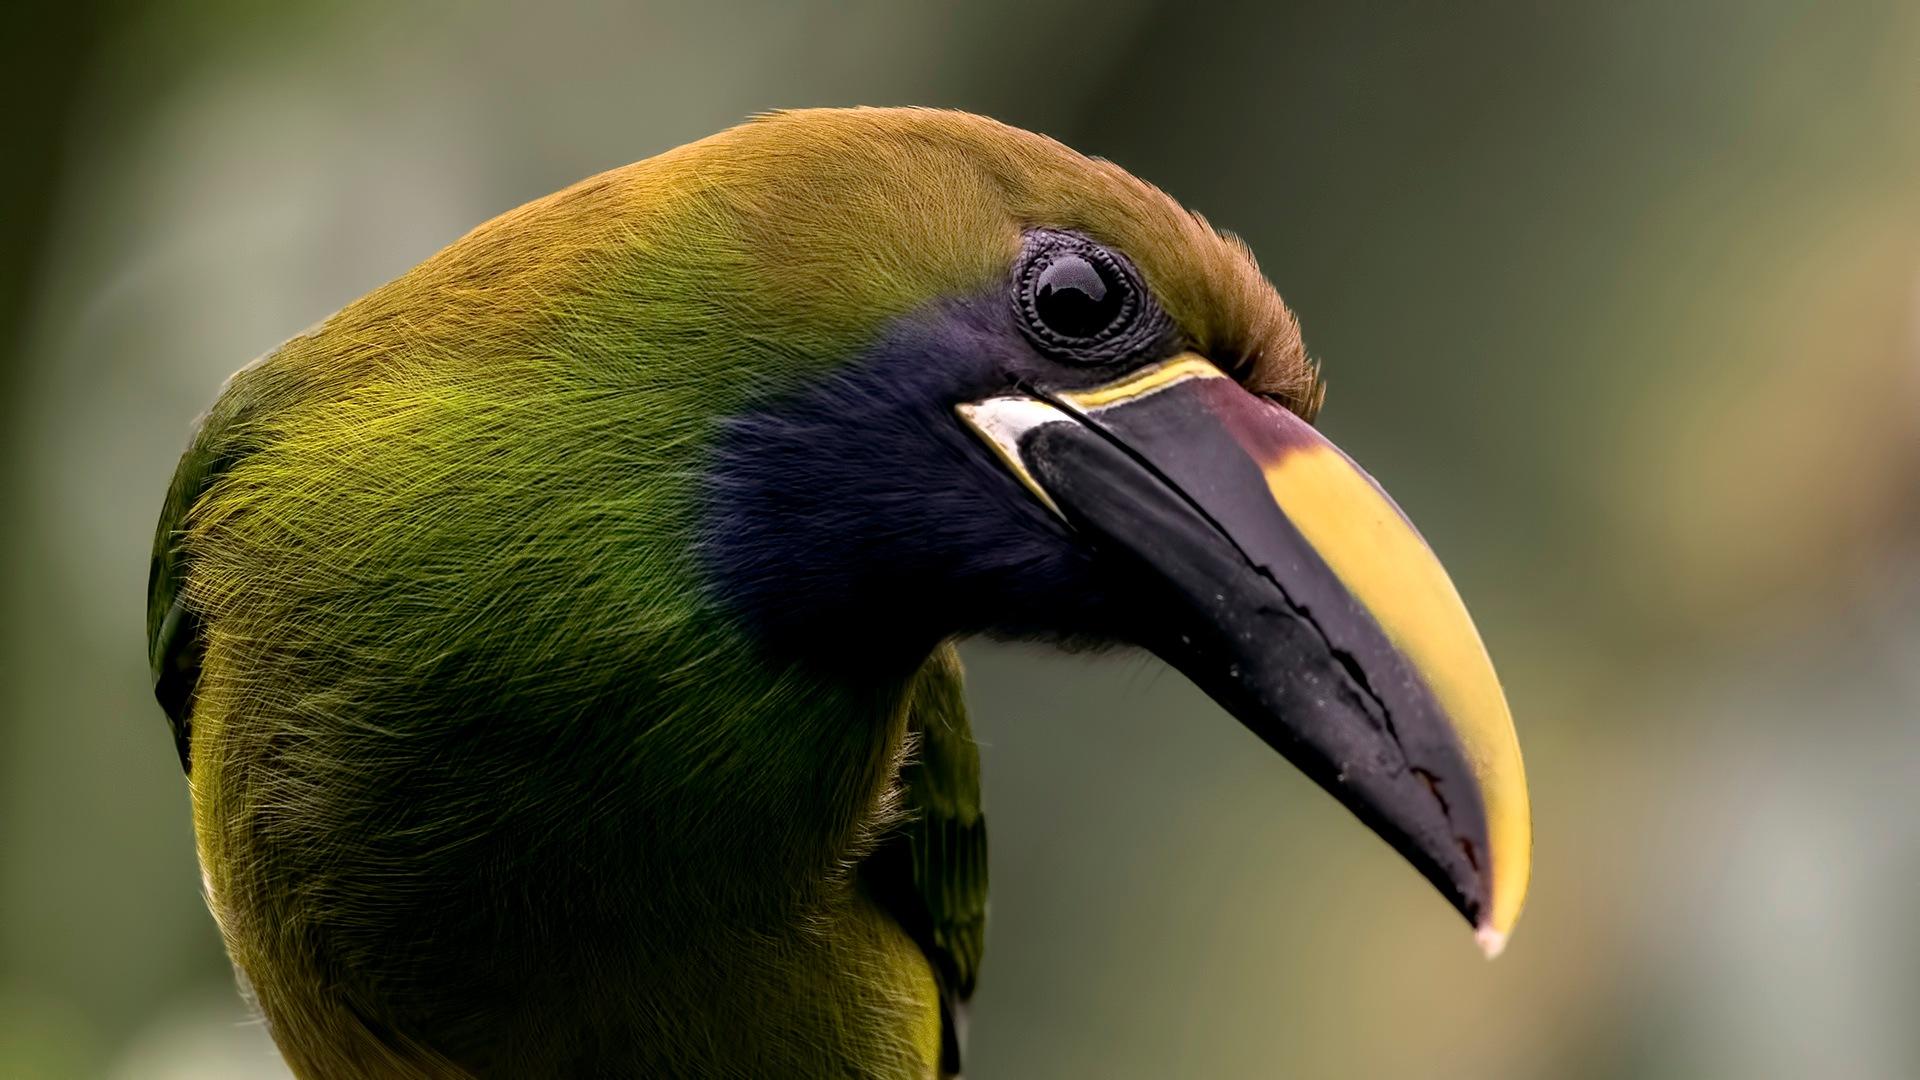 emerald toucaned 3 by ihsan çiçek